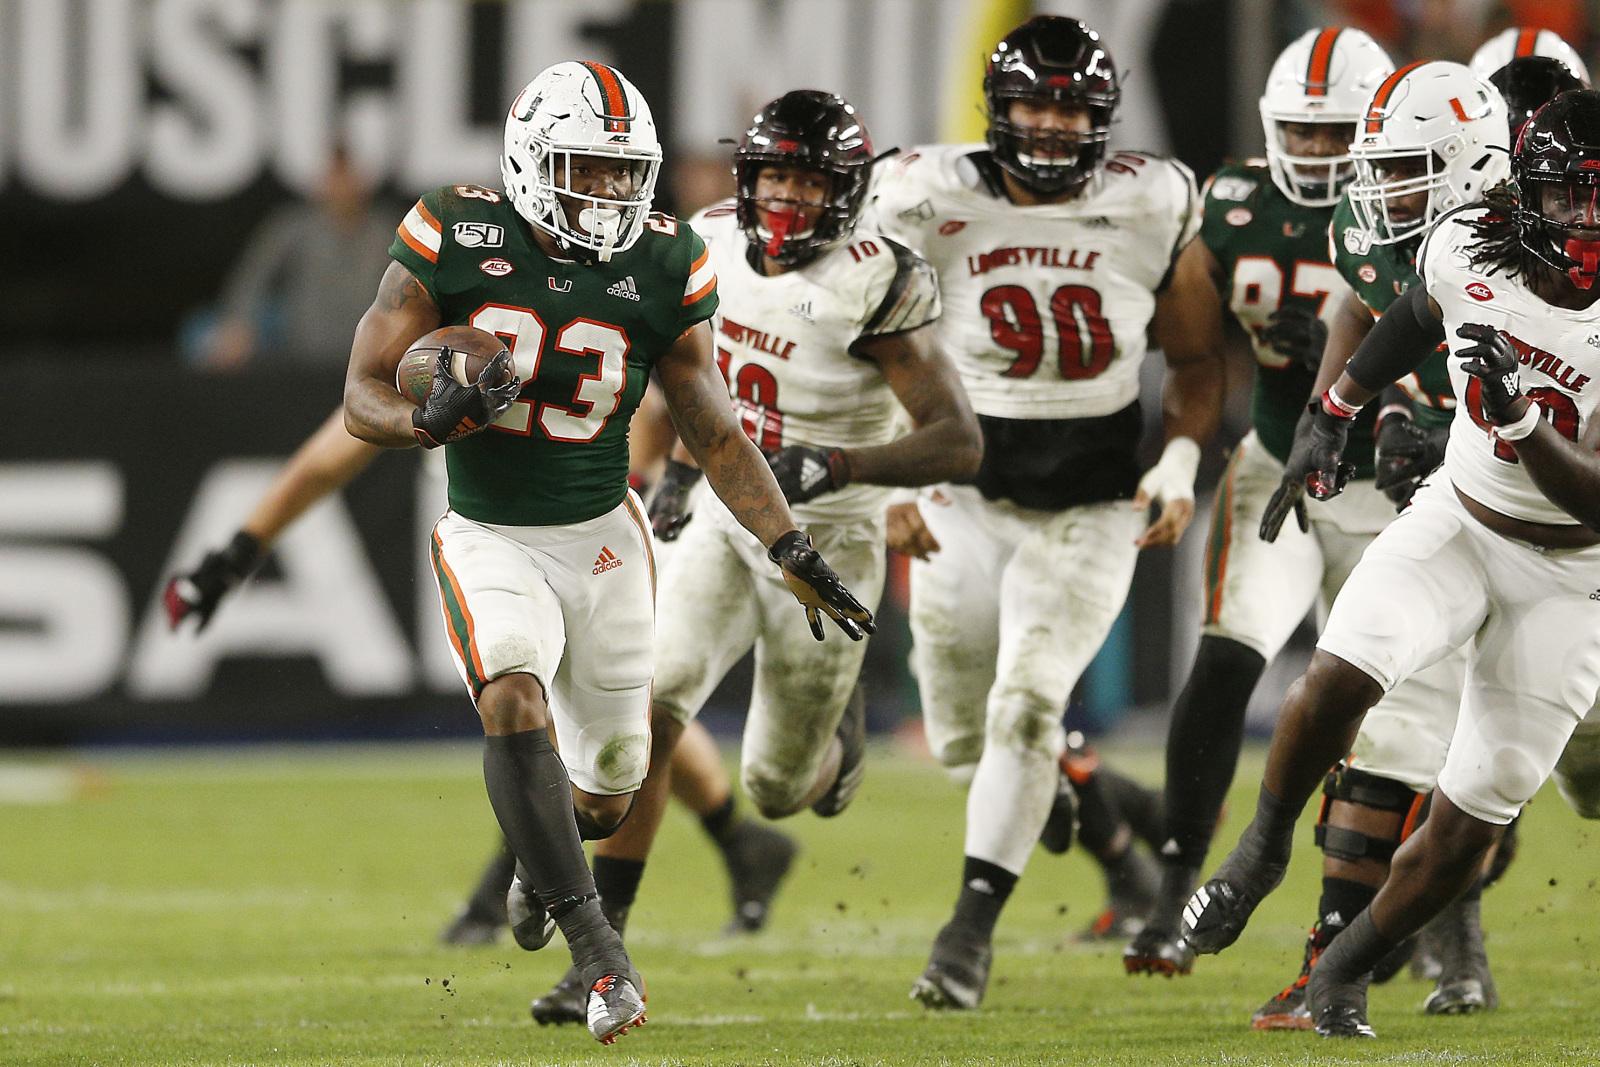 Miami Football 2019 Game Versus Louisville Much Closer Than Score